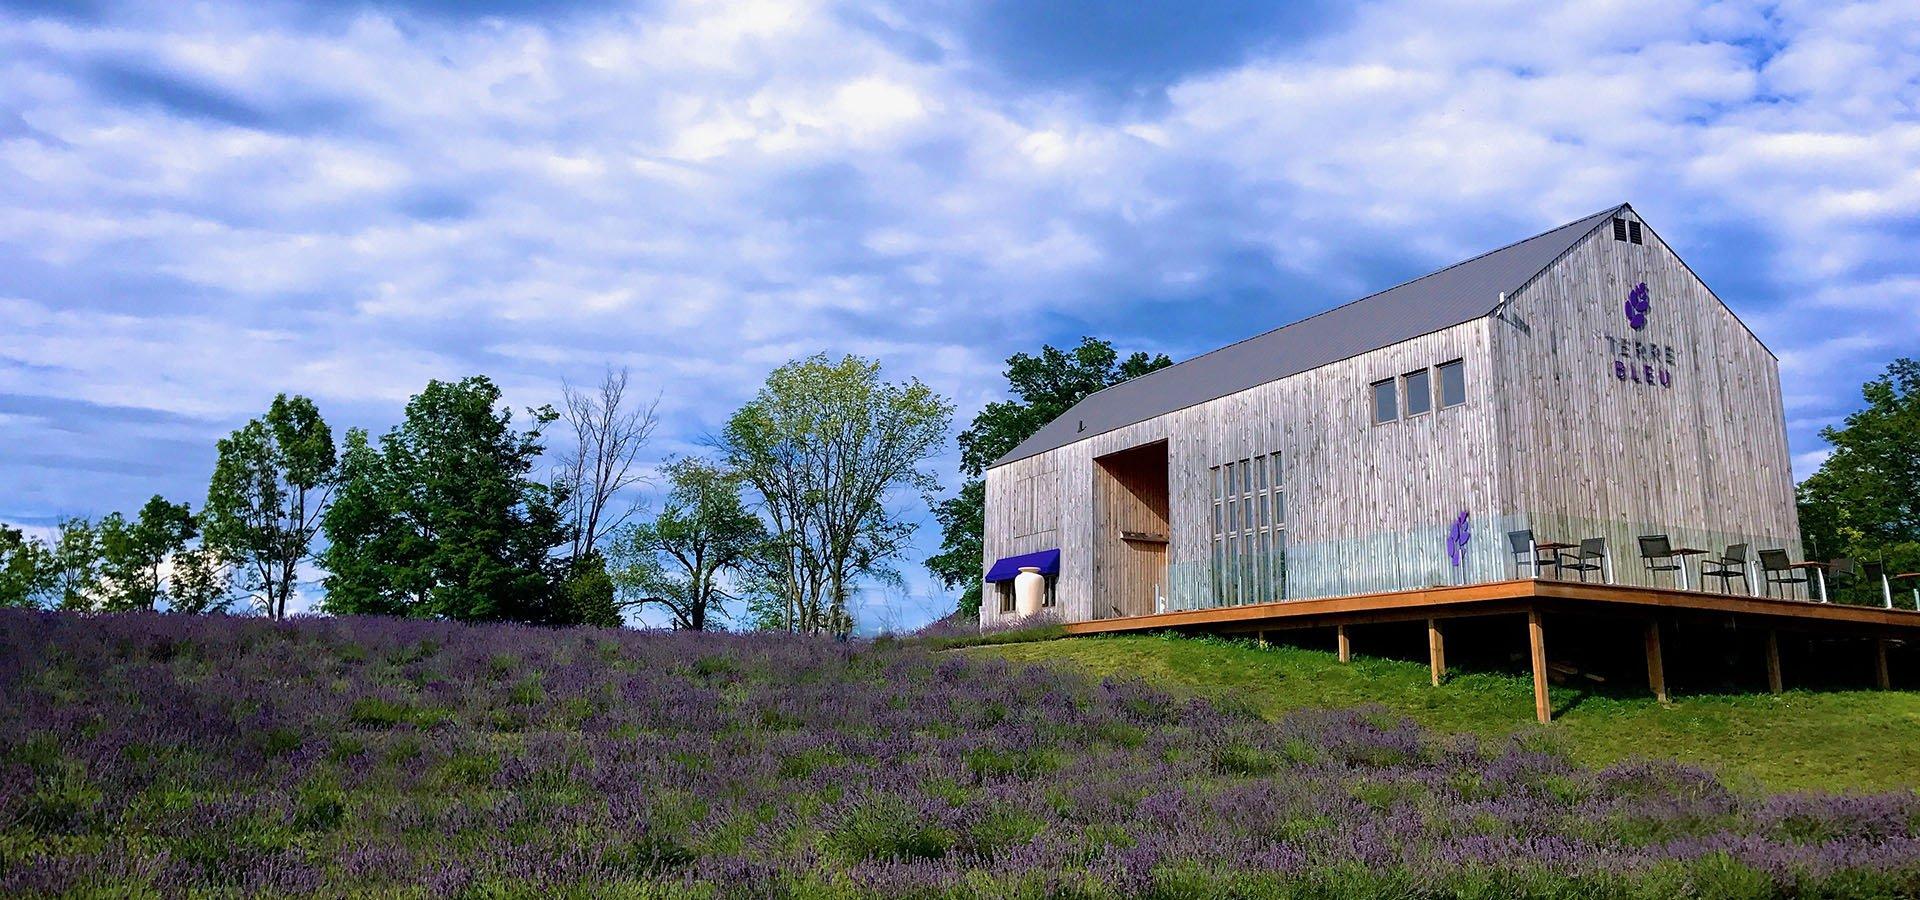 Terre_Bleu_Lavender_Farm_Field_and_Store.jpg